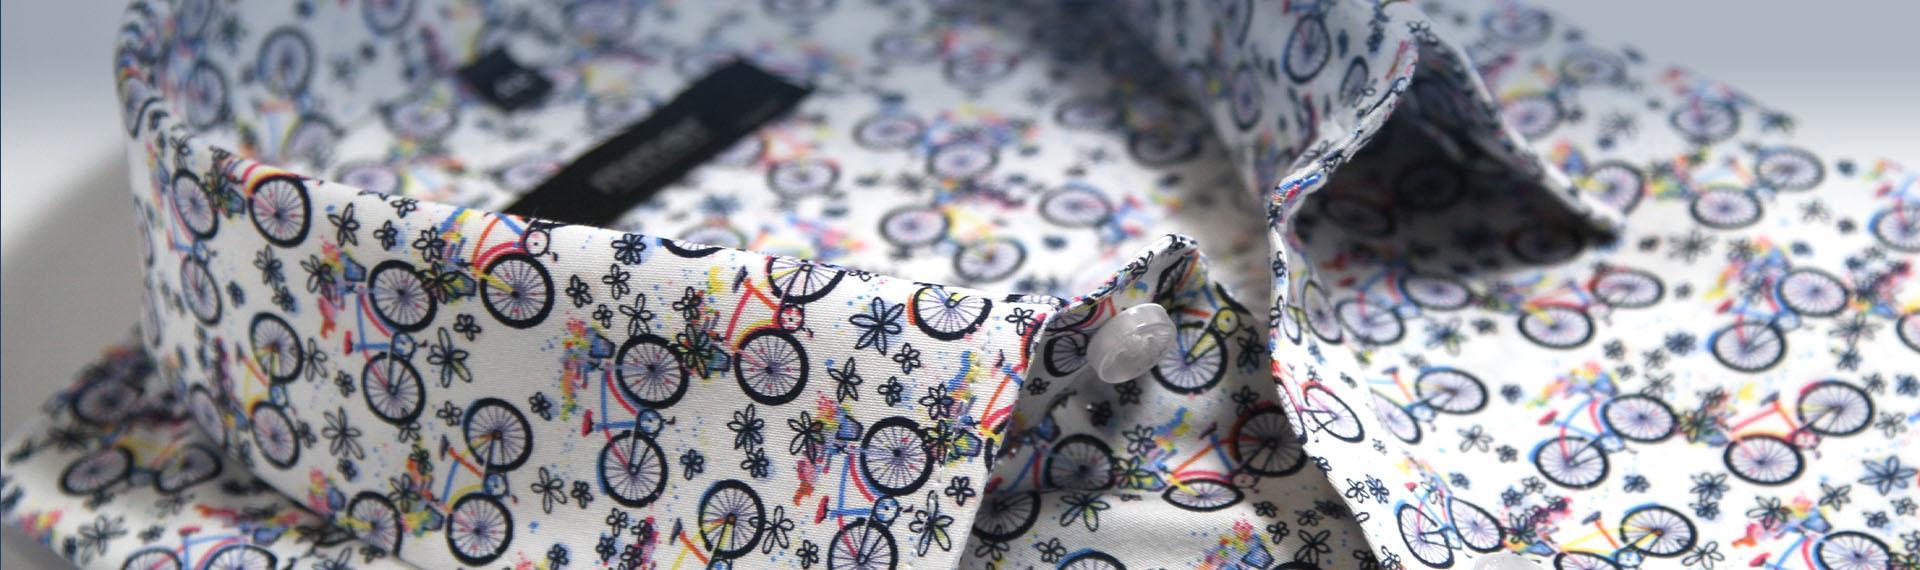 Kolorowa koszula